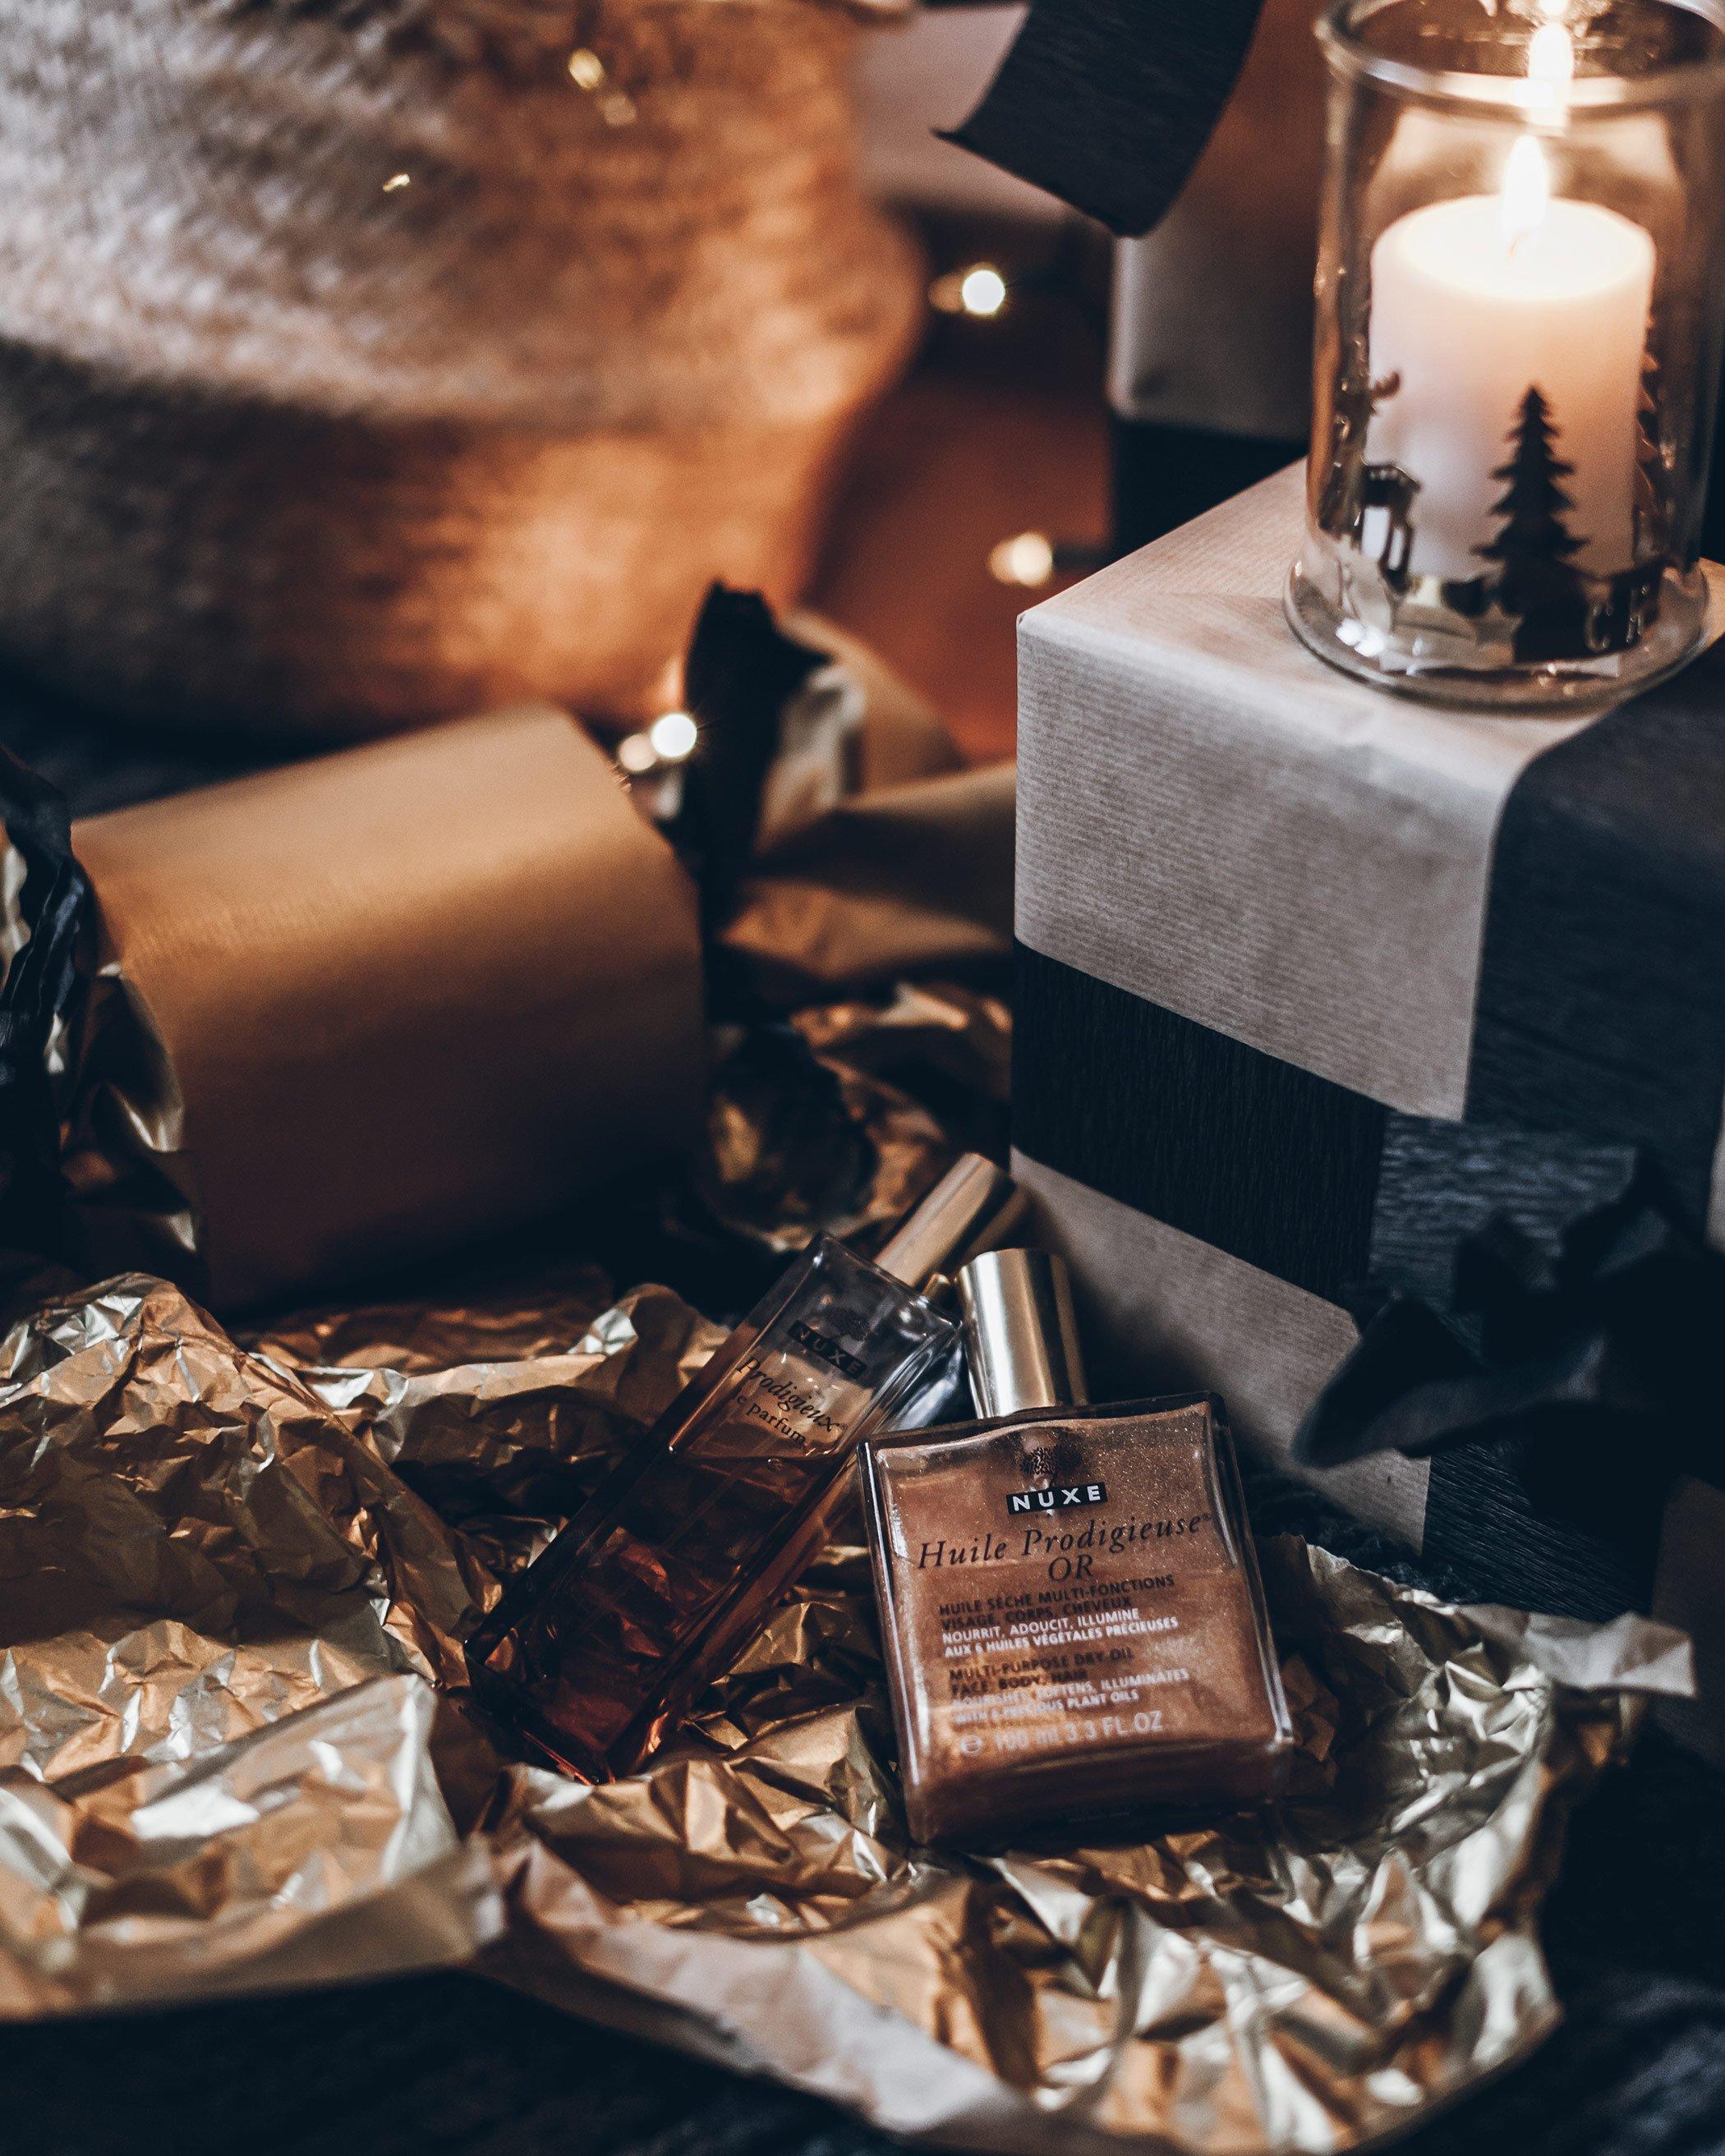 mikuta-skagen-gifting-guide-5